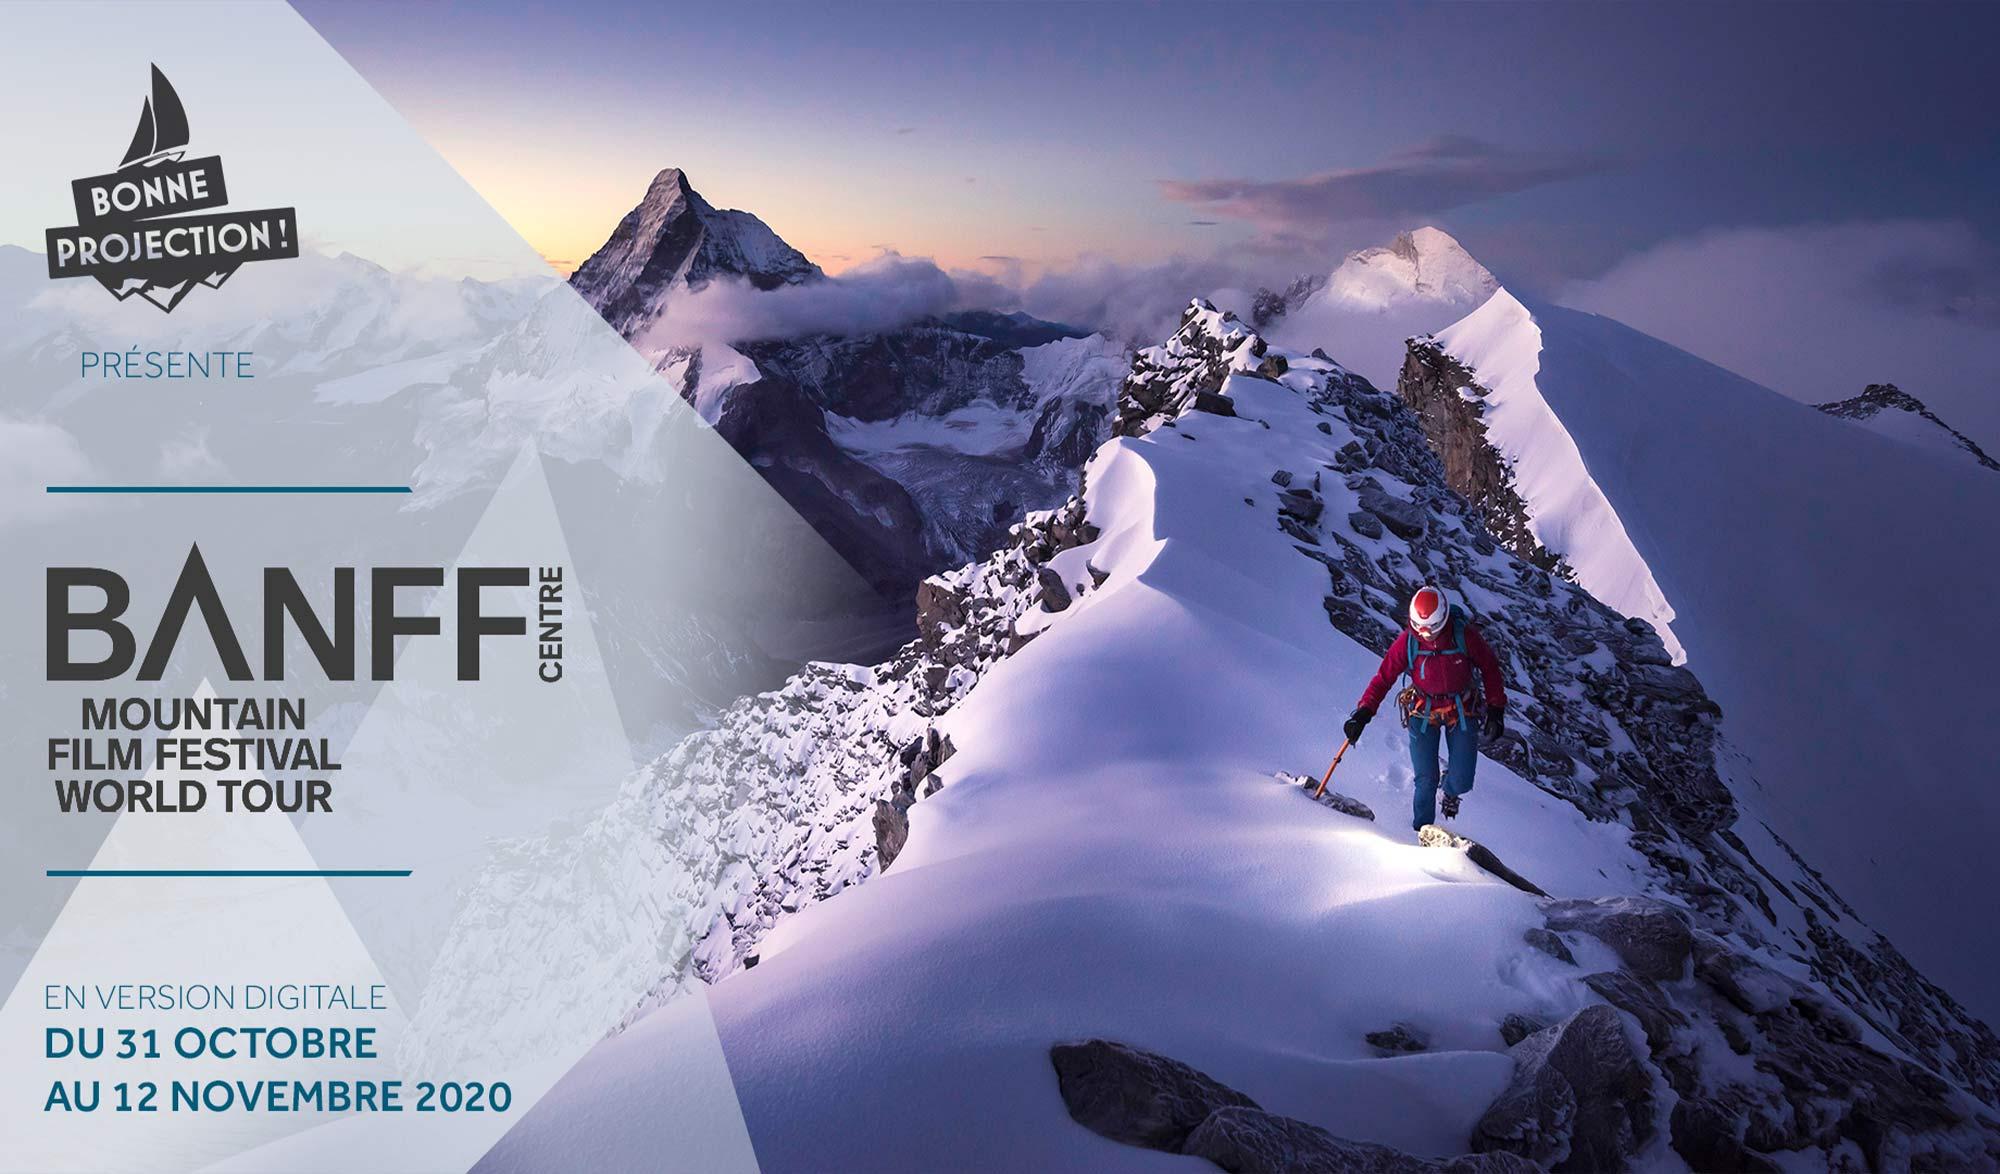 Banff Festival 2020